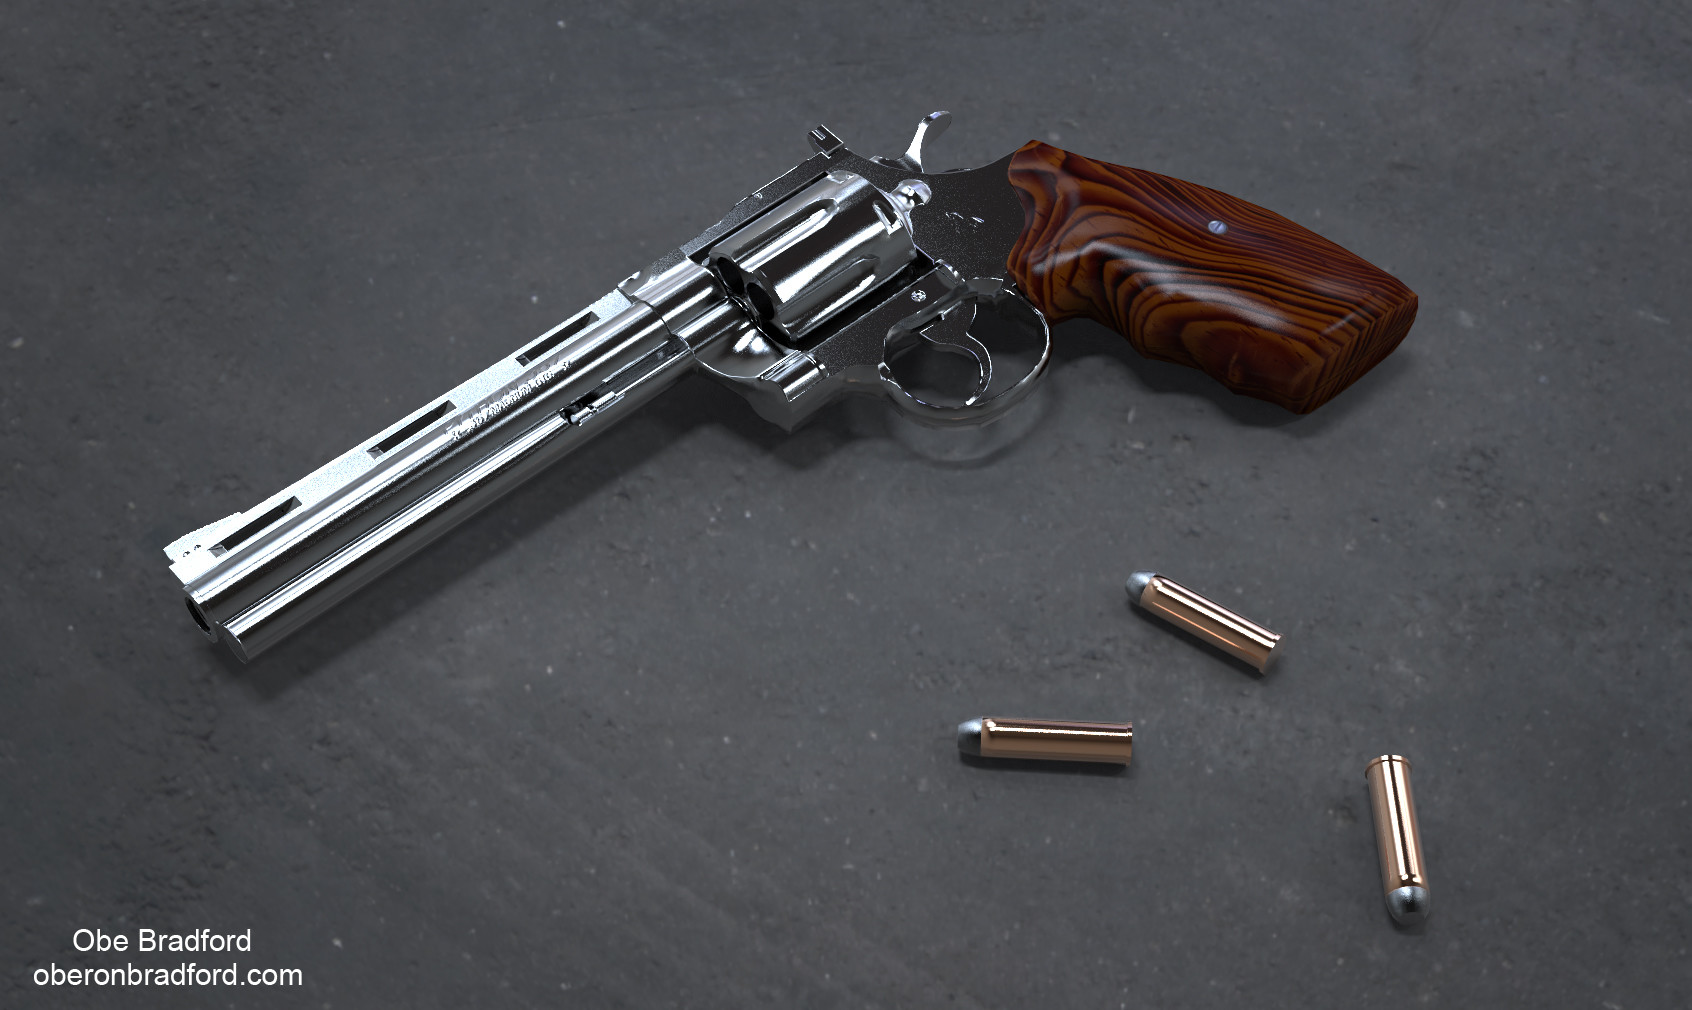 Oberon obe bradford obe bradford revolver update